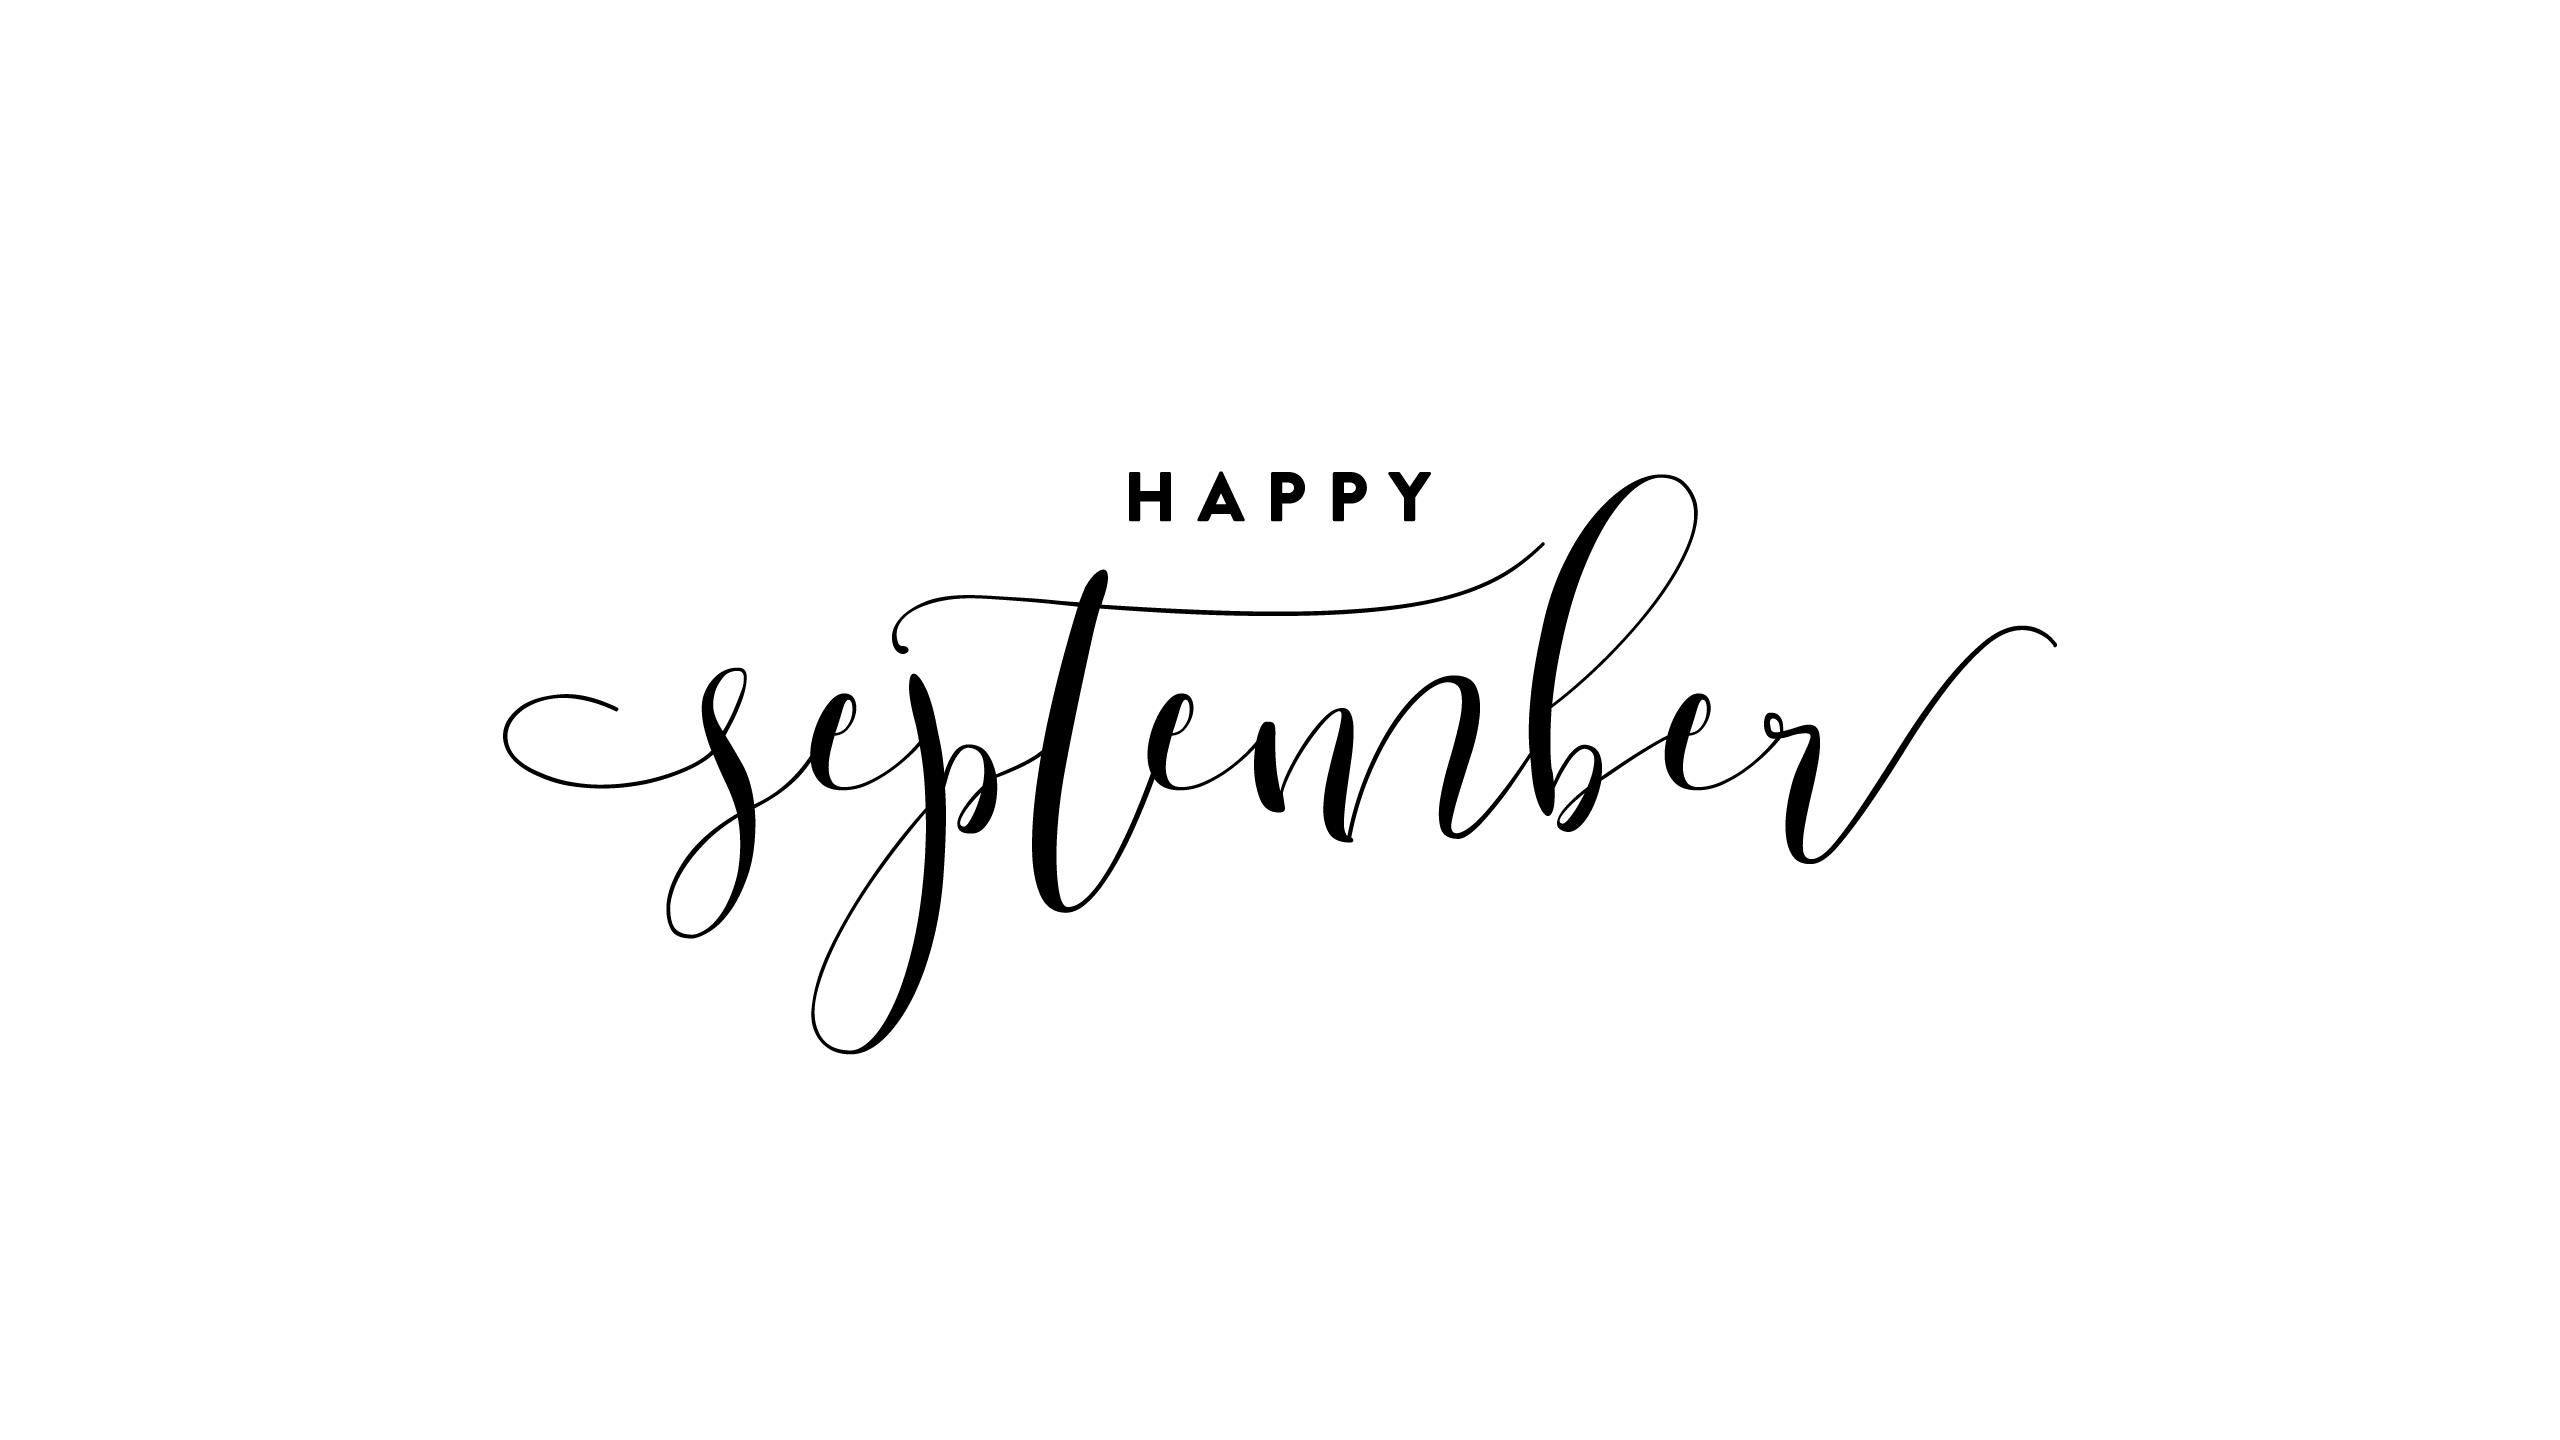 Calendar Happy September Verse